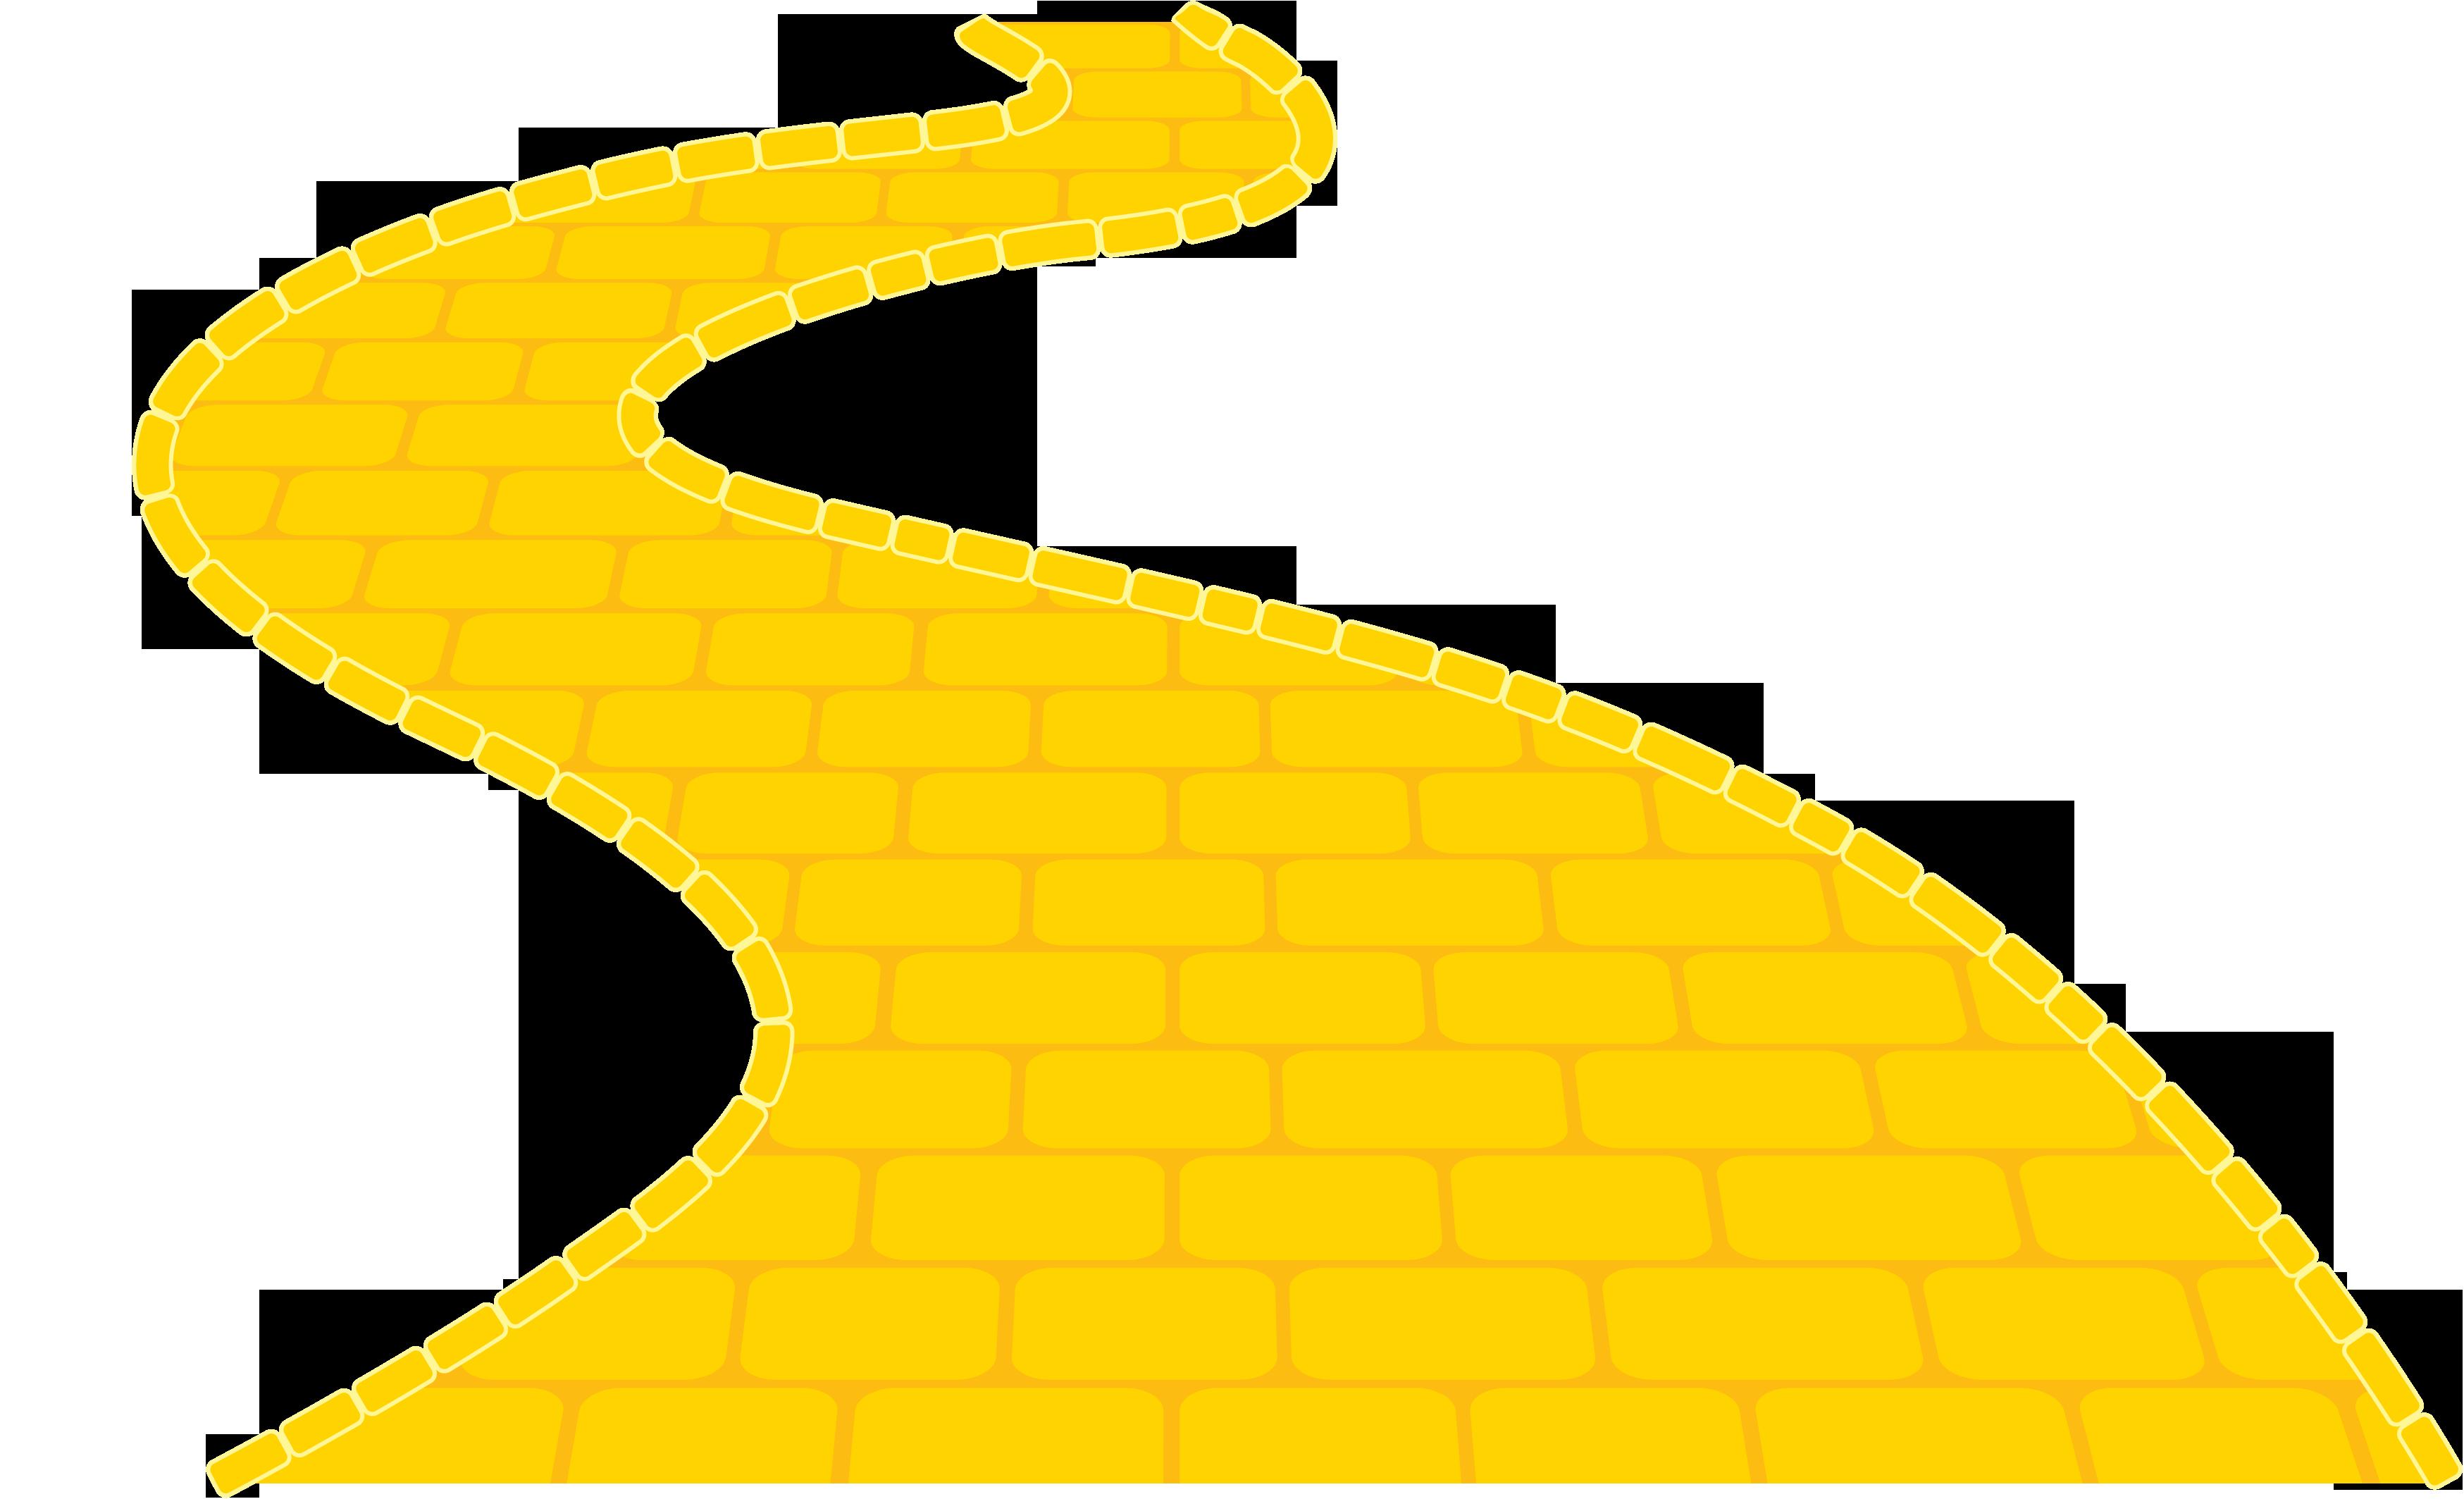 Highway clipart journey. Yellow brick road image